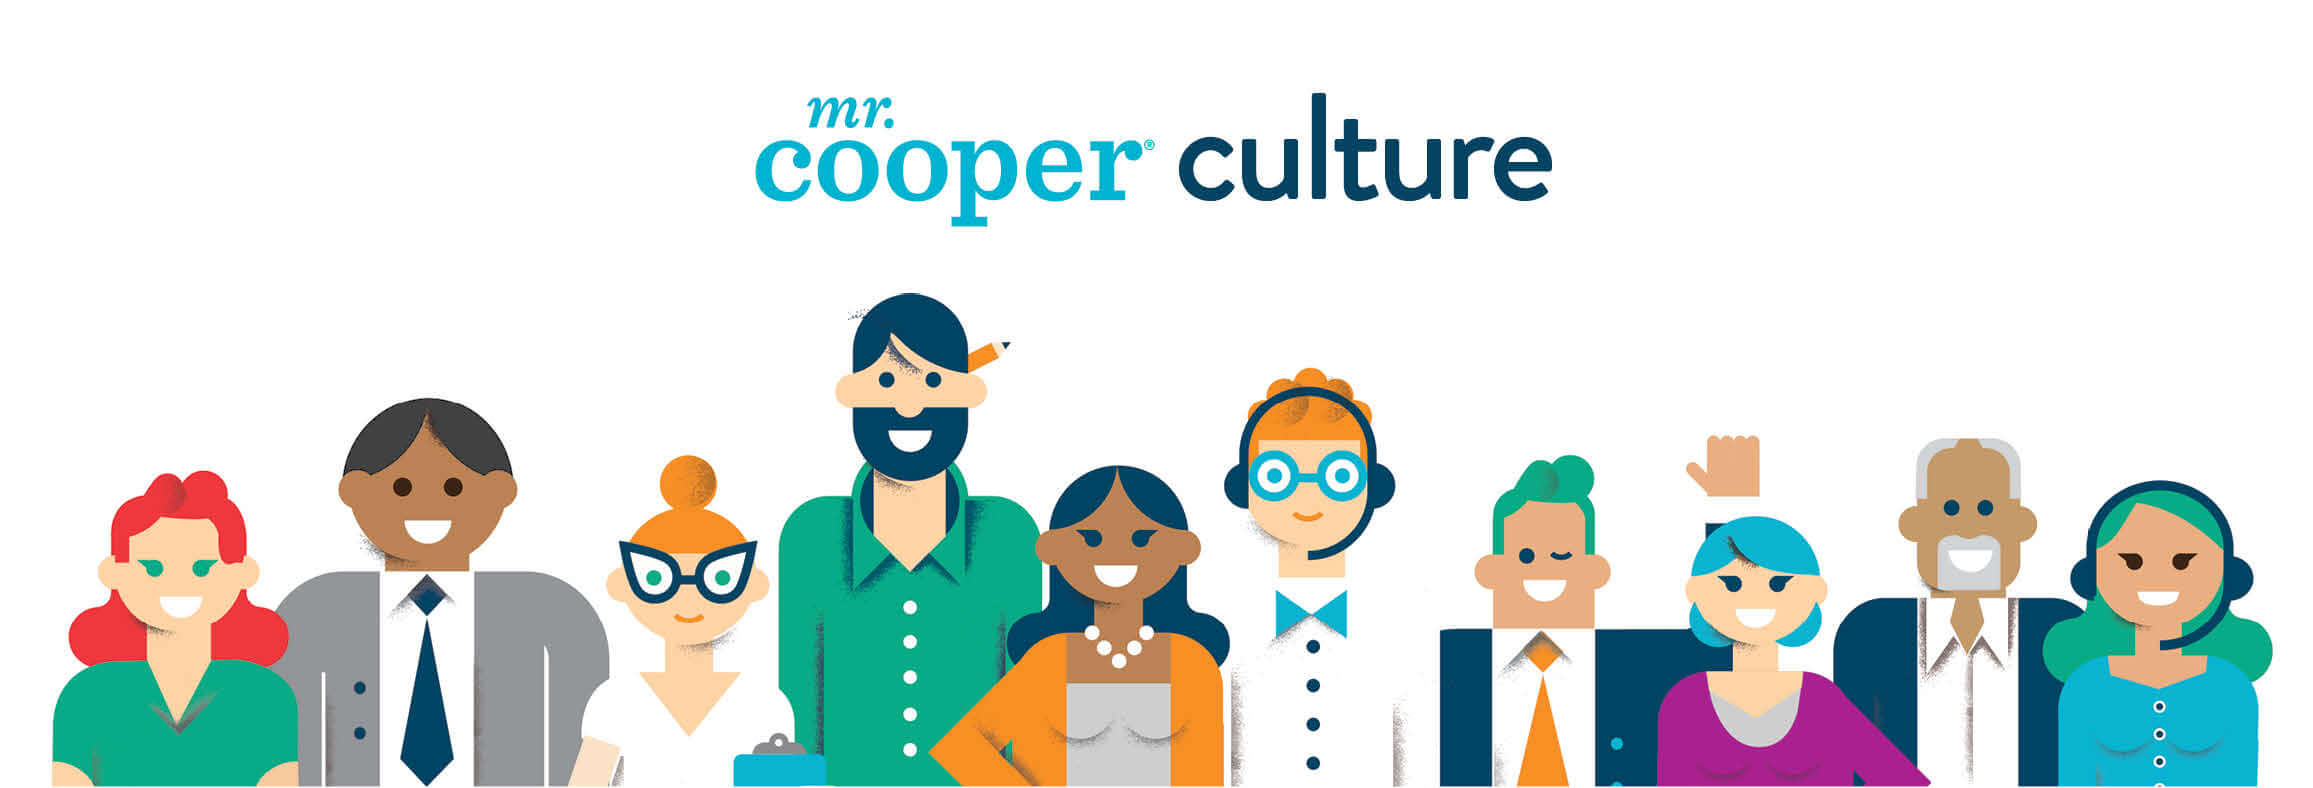 Mr. Cooper celebrates diversity and inclusion.